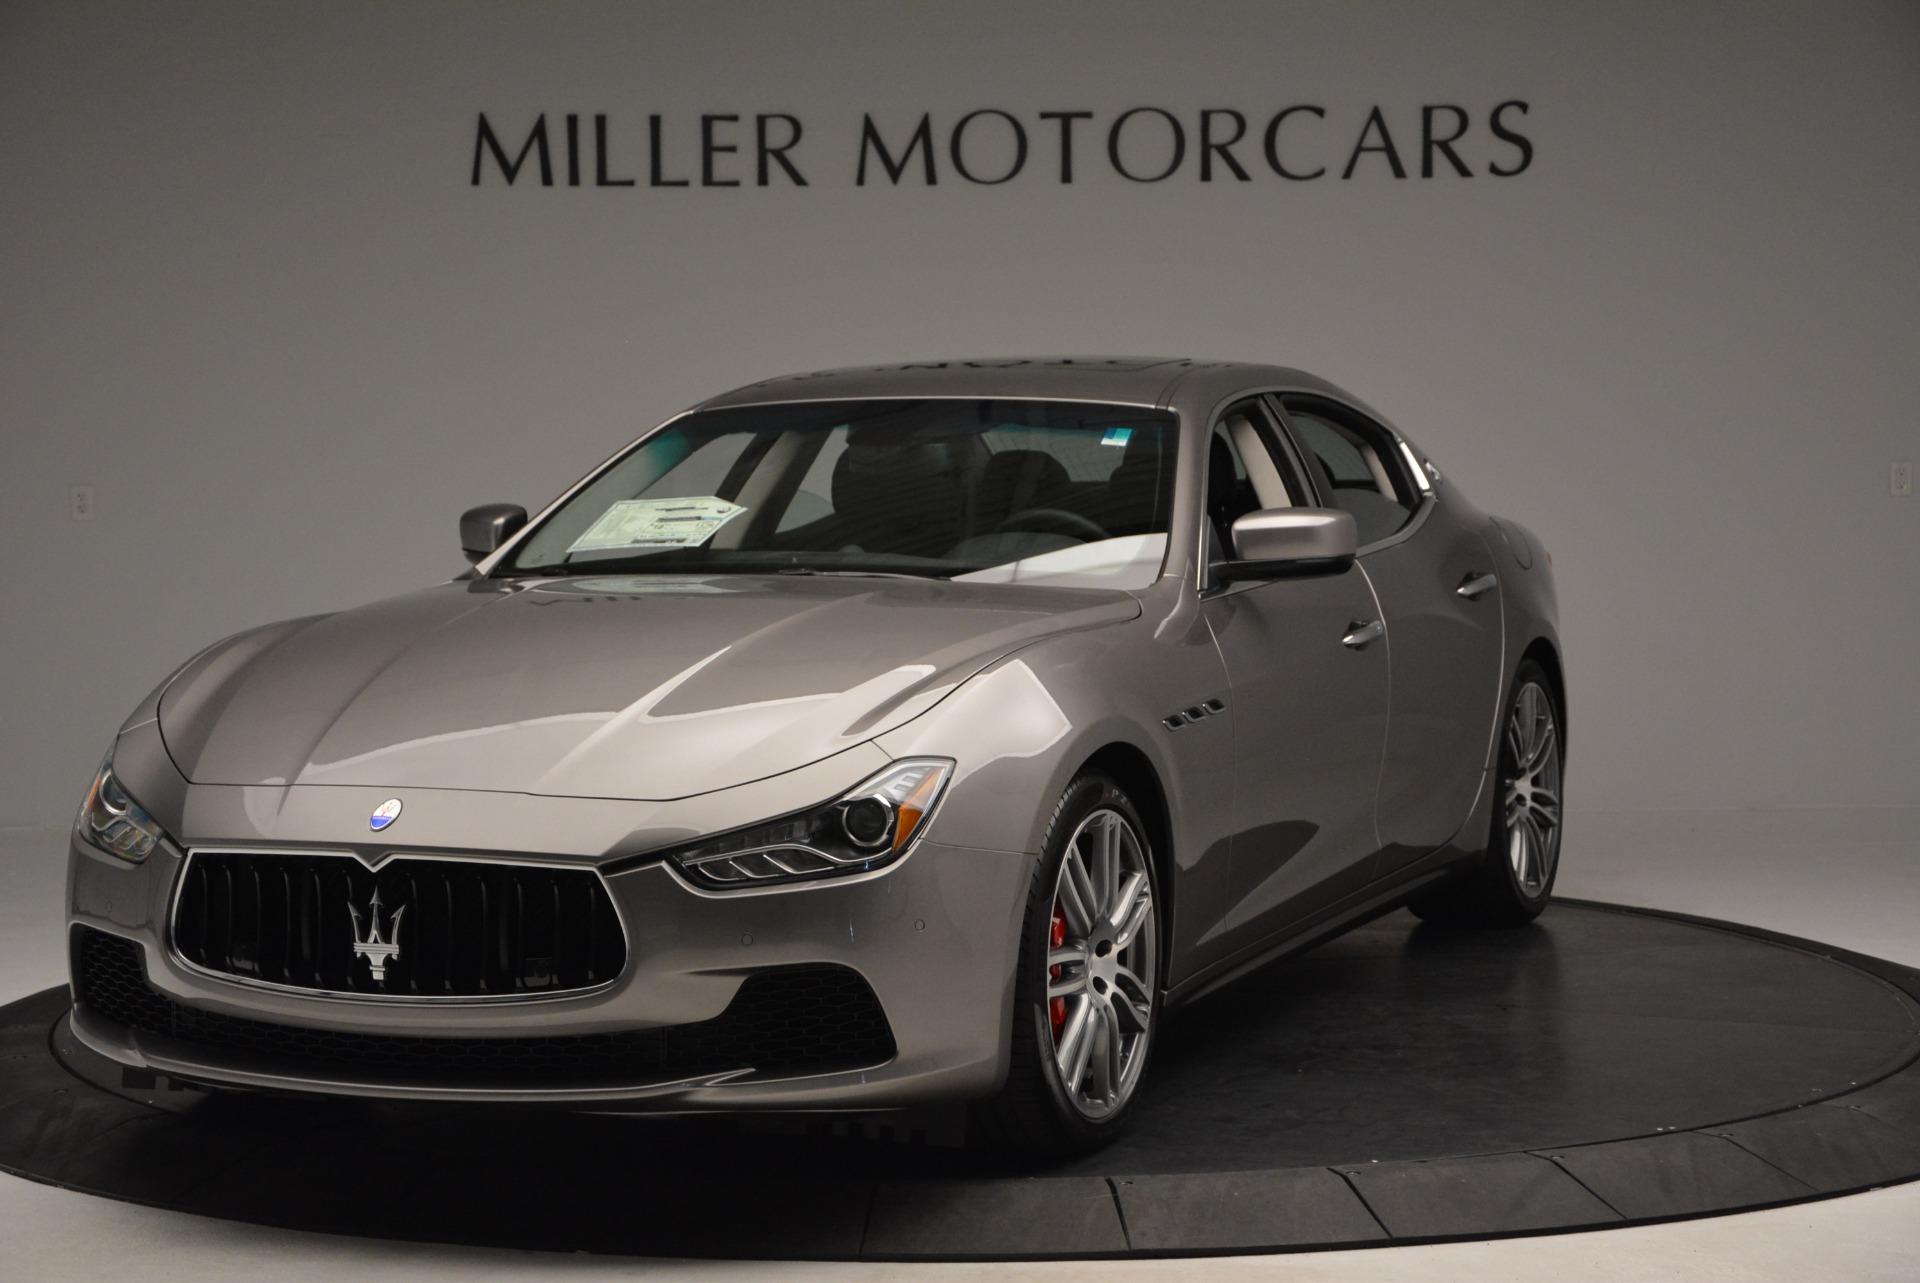 Used 2014 Maserati Ghibli S Q4 For Sale In Greenwich, CT 2562_main